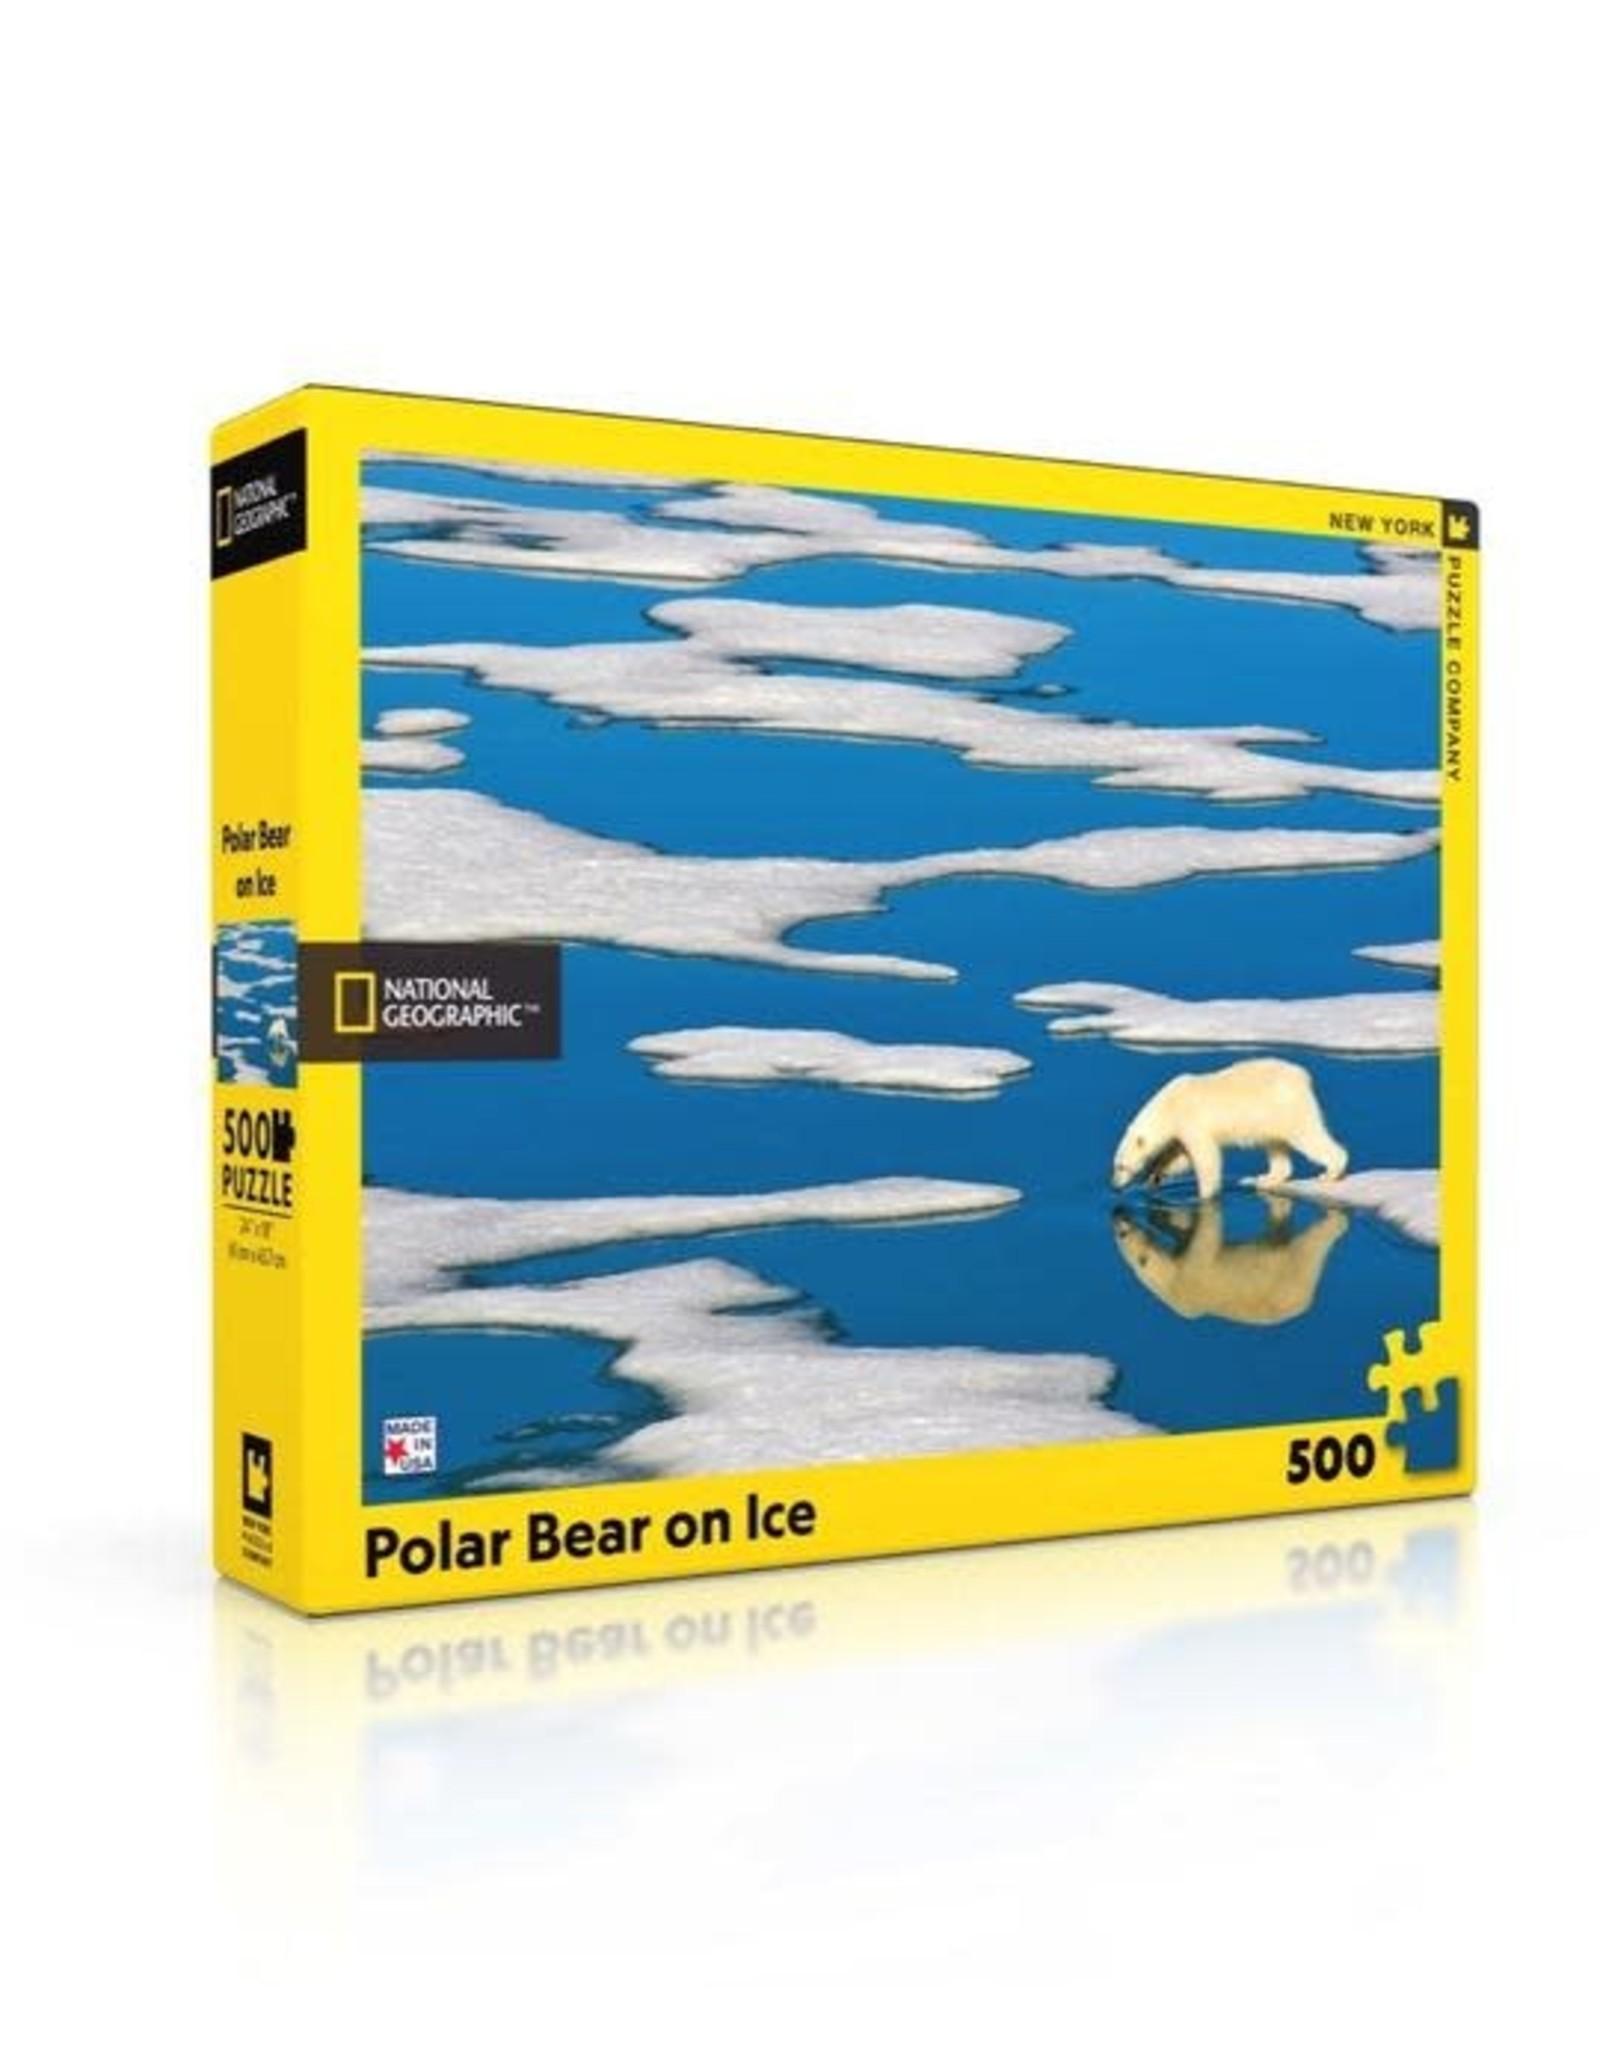 Polar Bear on Ice Puzzle, 500 pieces